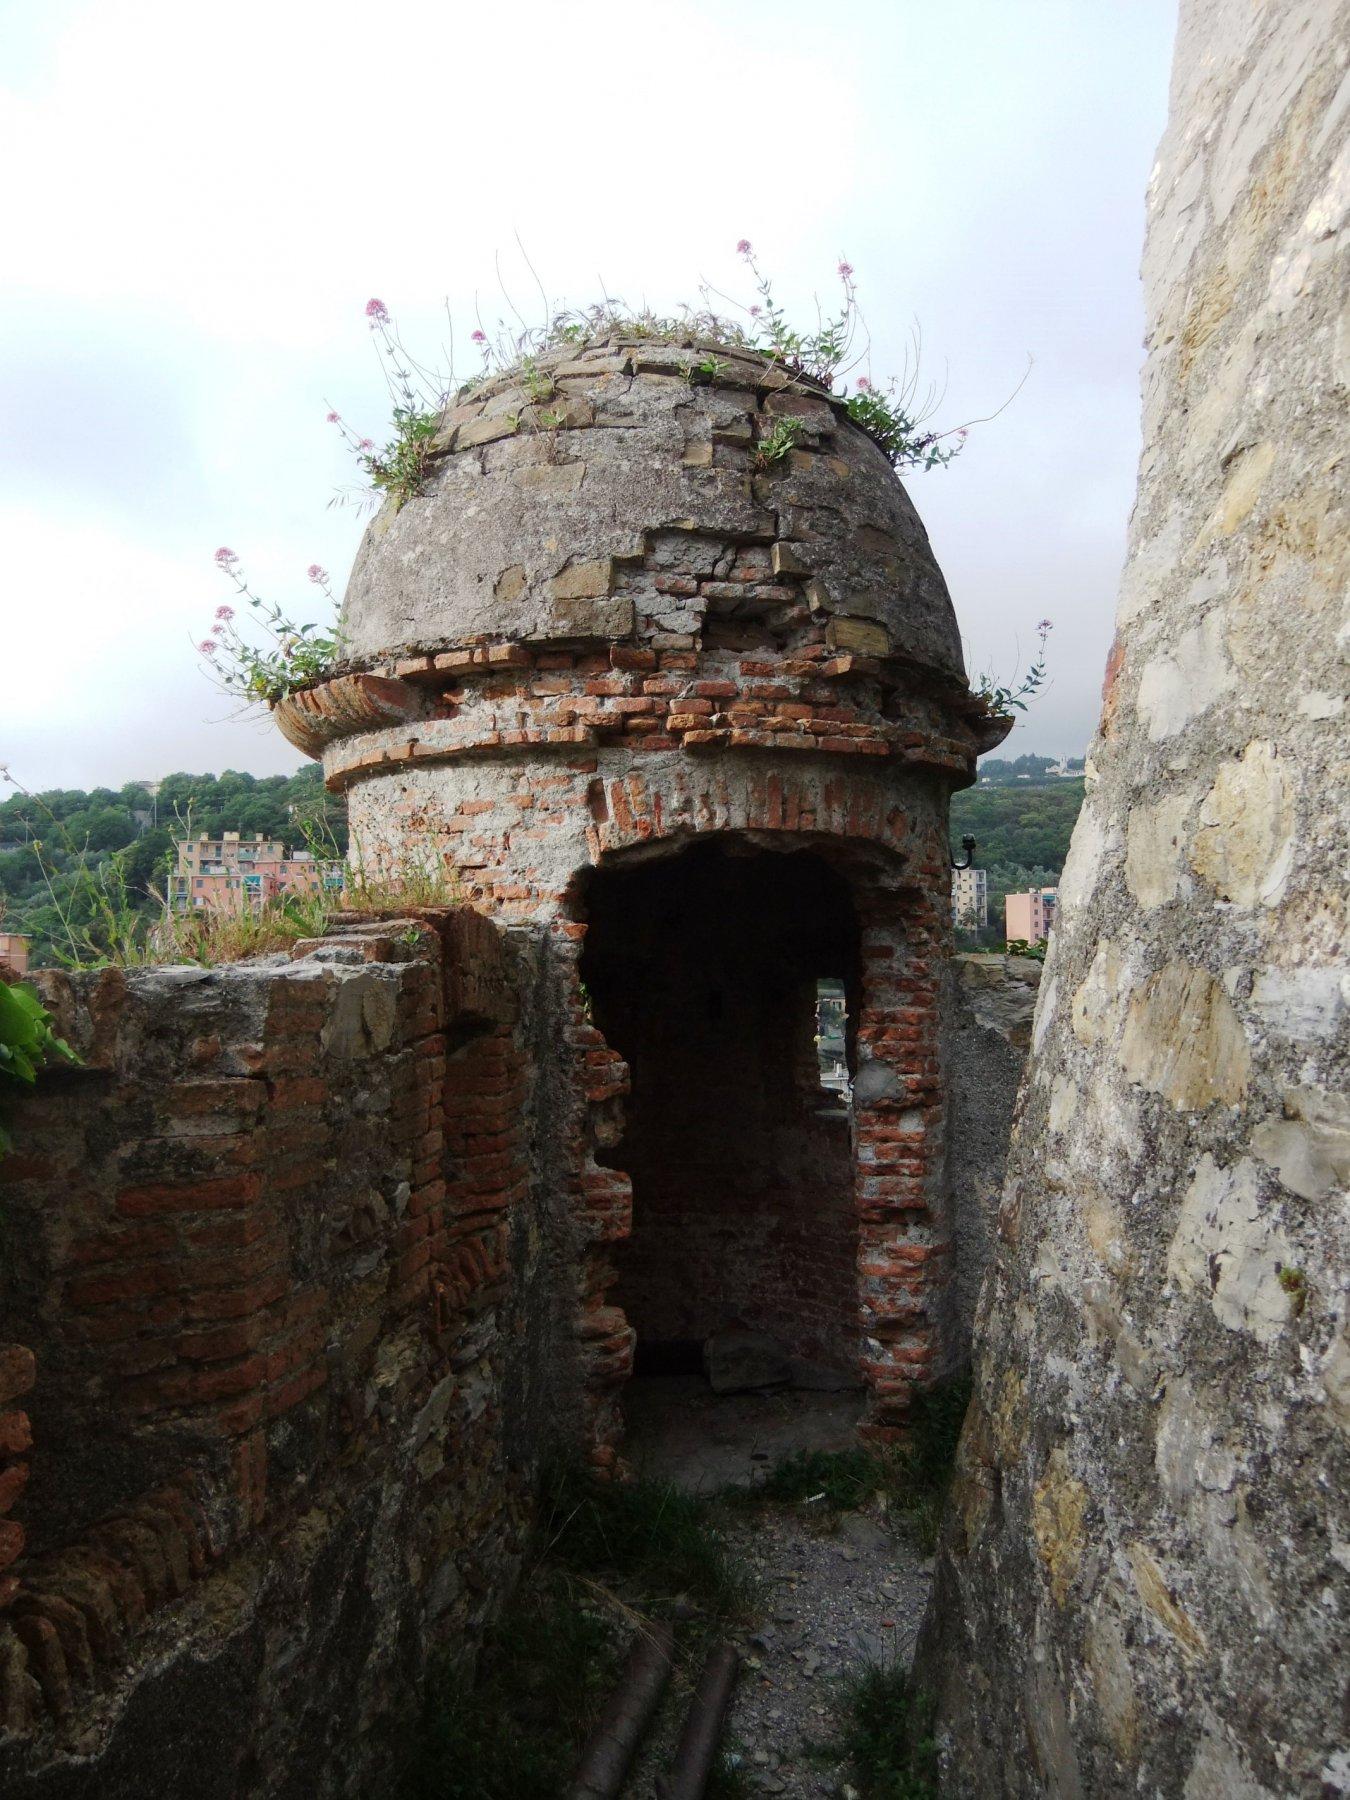 Garitta di Forte Santa Tecla